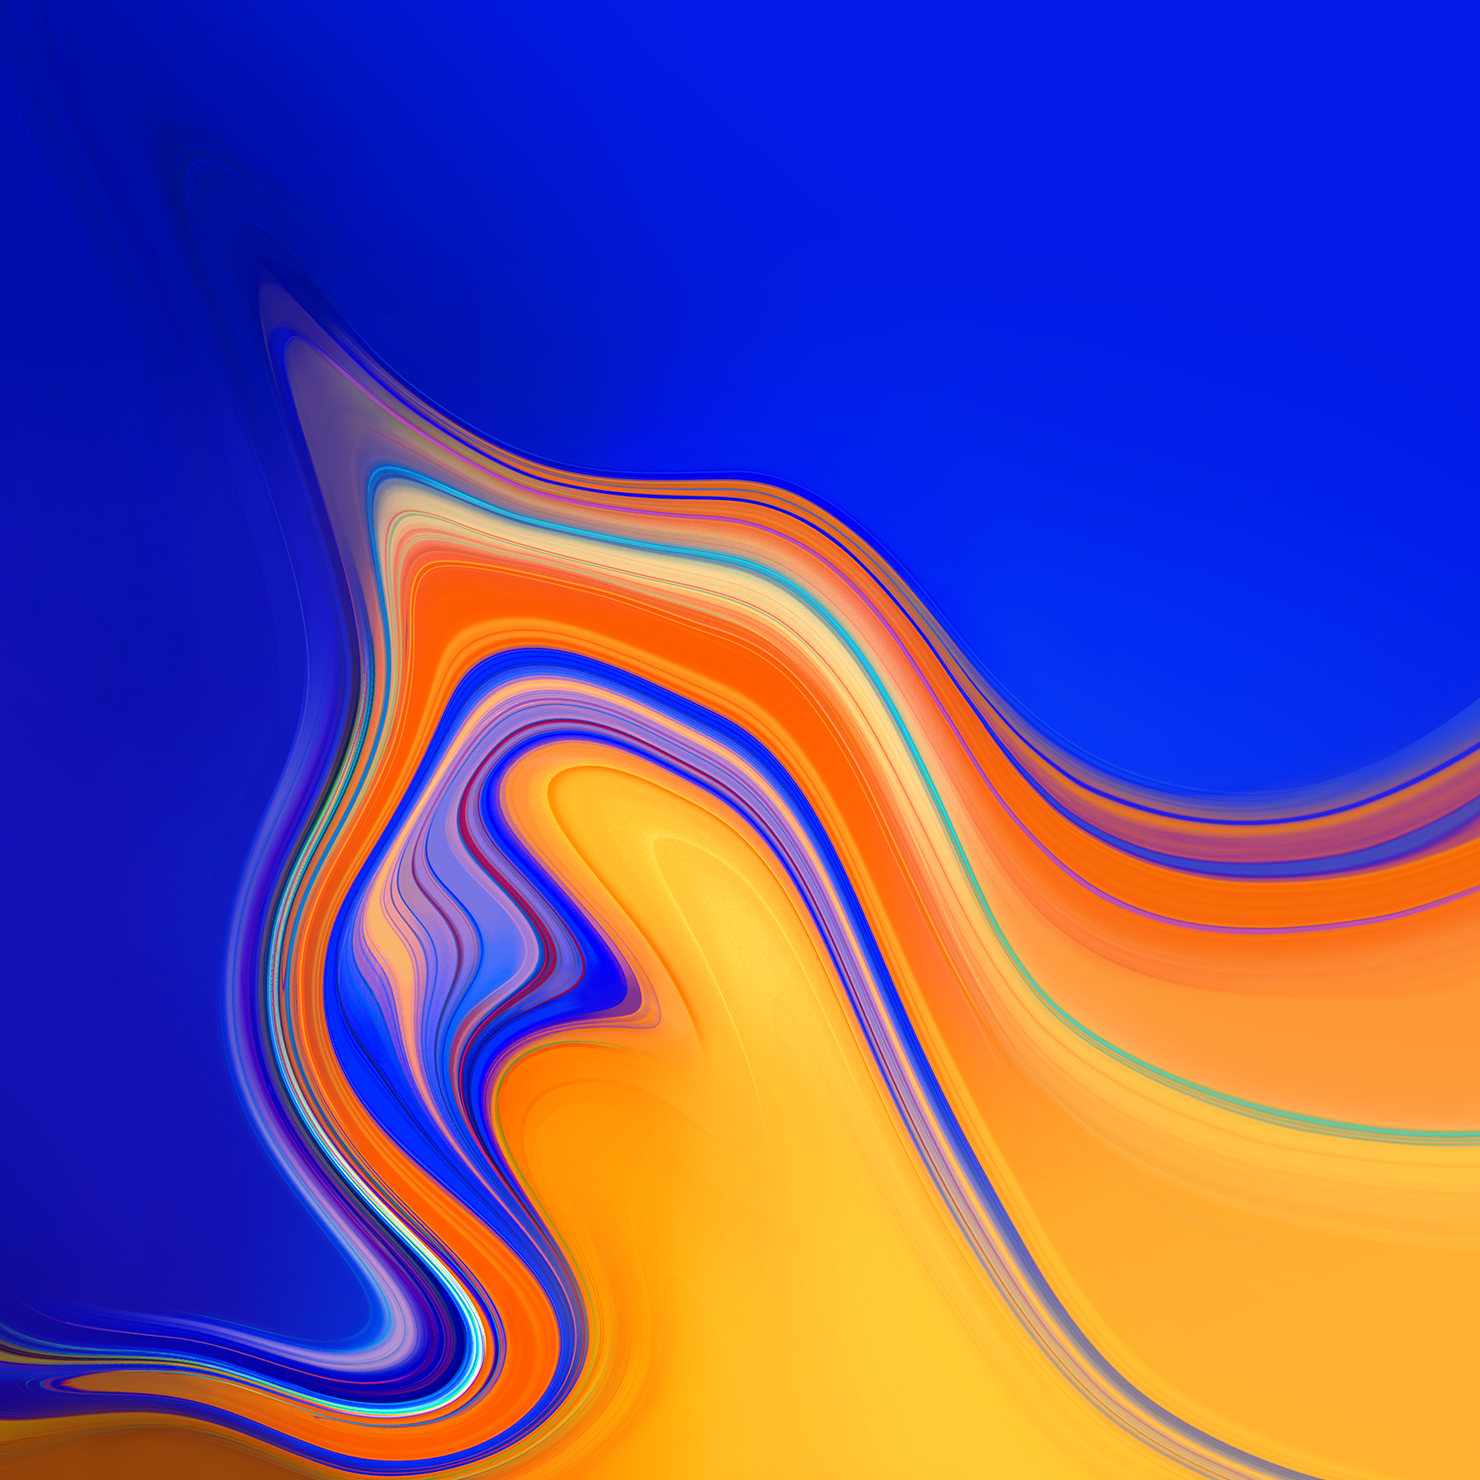 Samsung Galaxy J4 Plus 1480x1480 Download Hd Wallpaper Wallpapertip